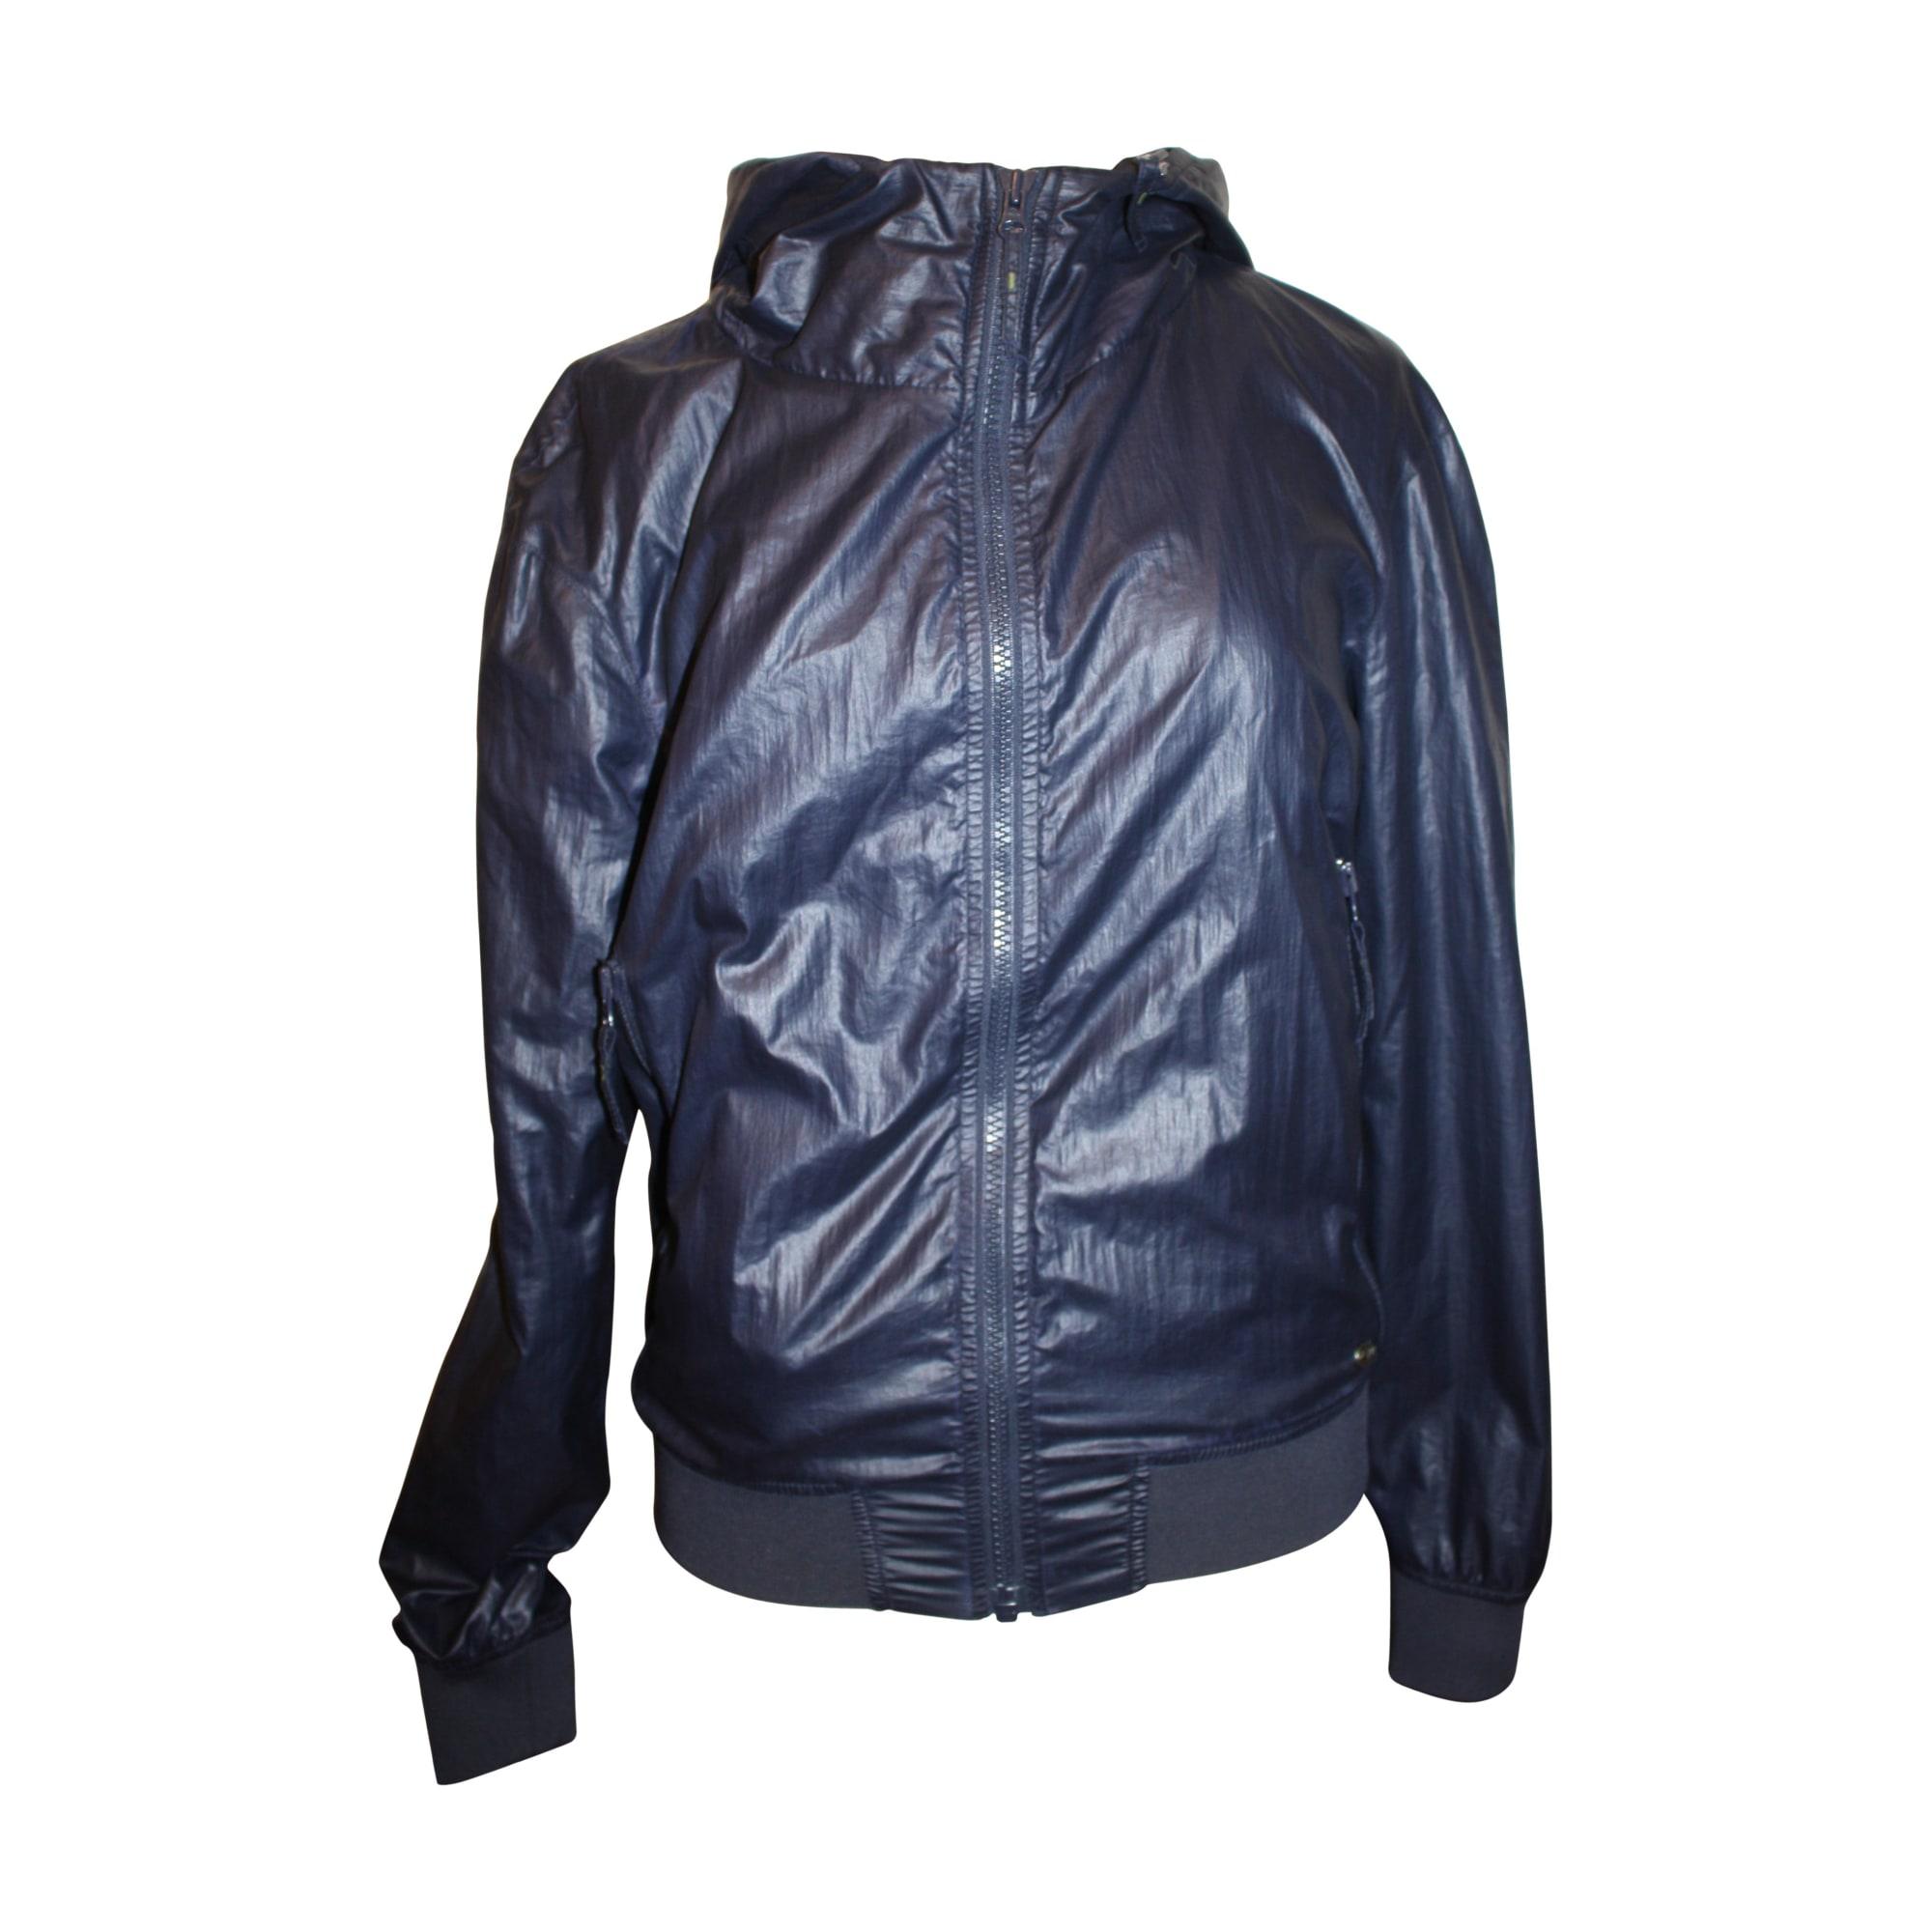 Jacket adolfo dominguez 44 s blue 3024023 for Adolfo dominguez womens coats